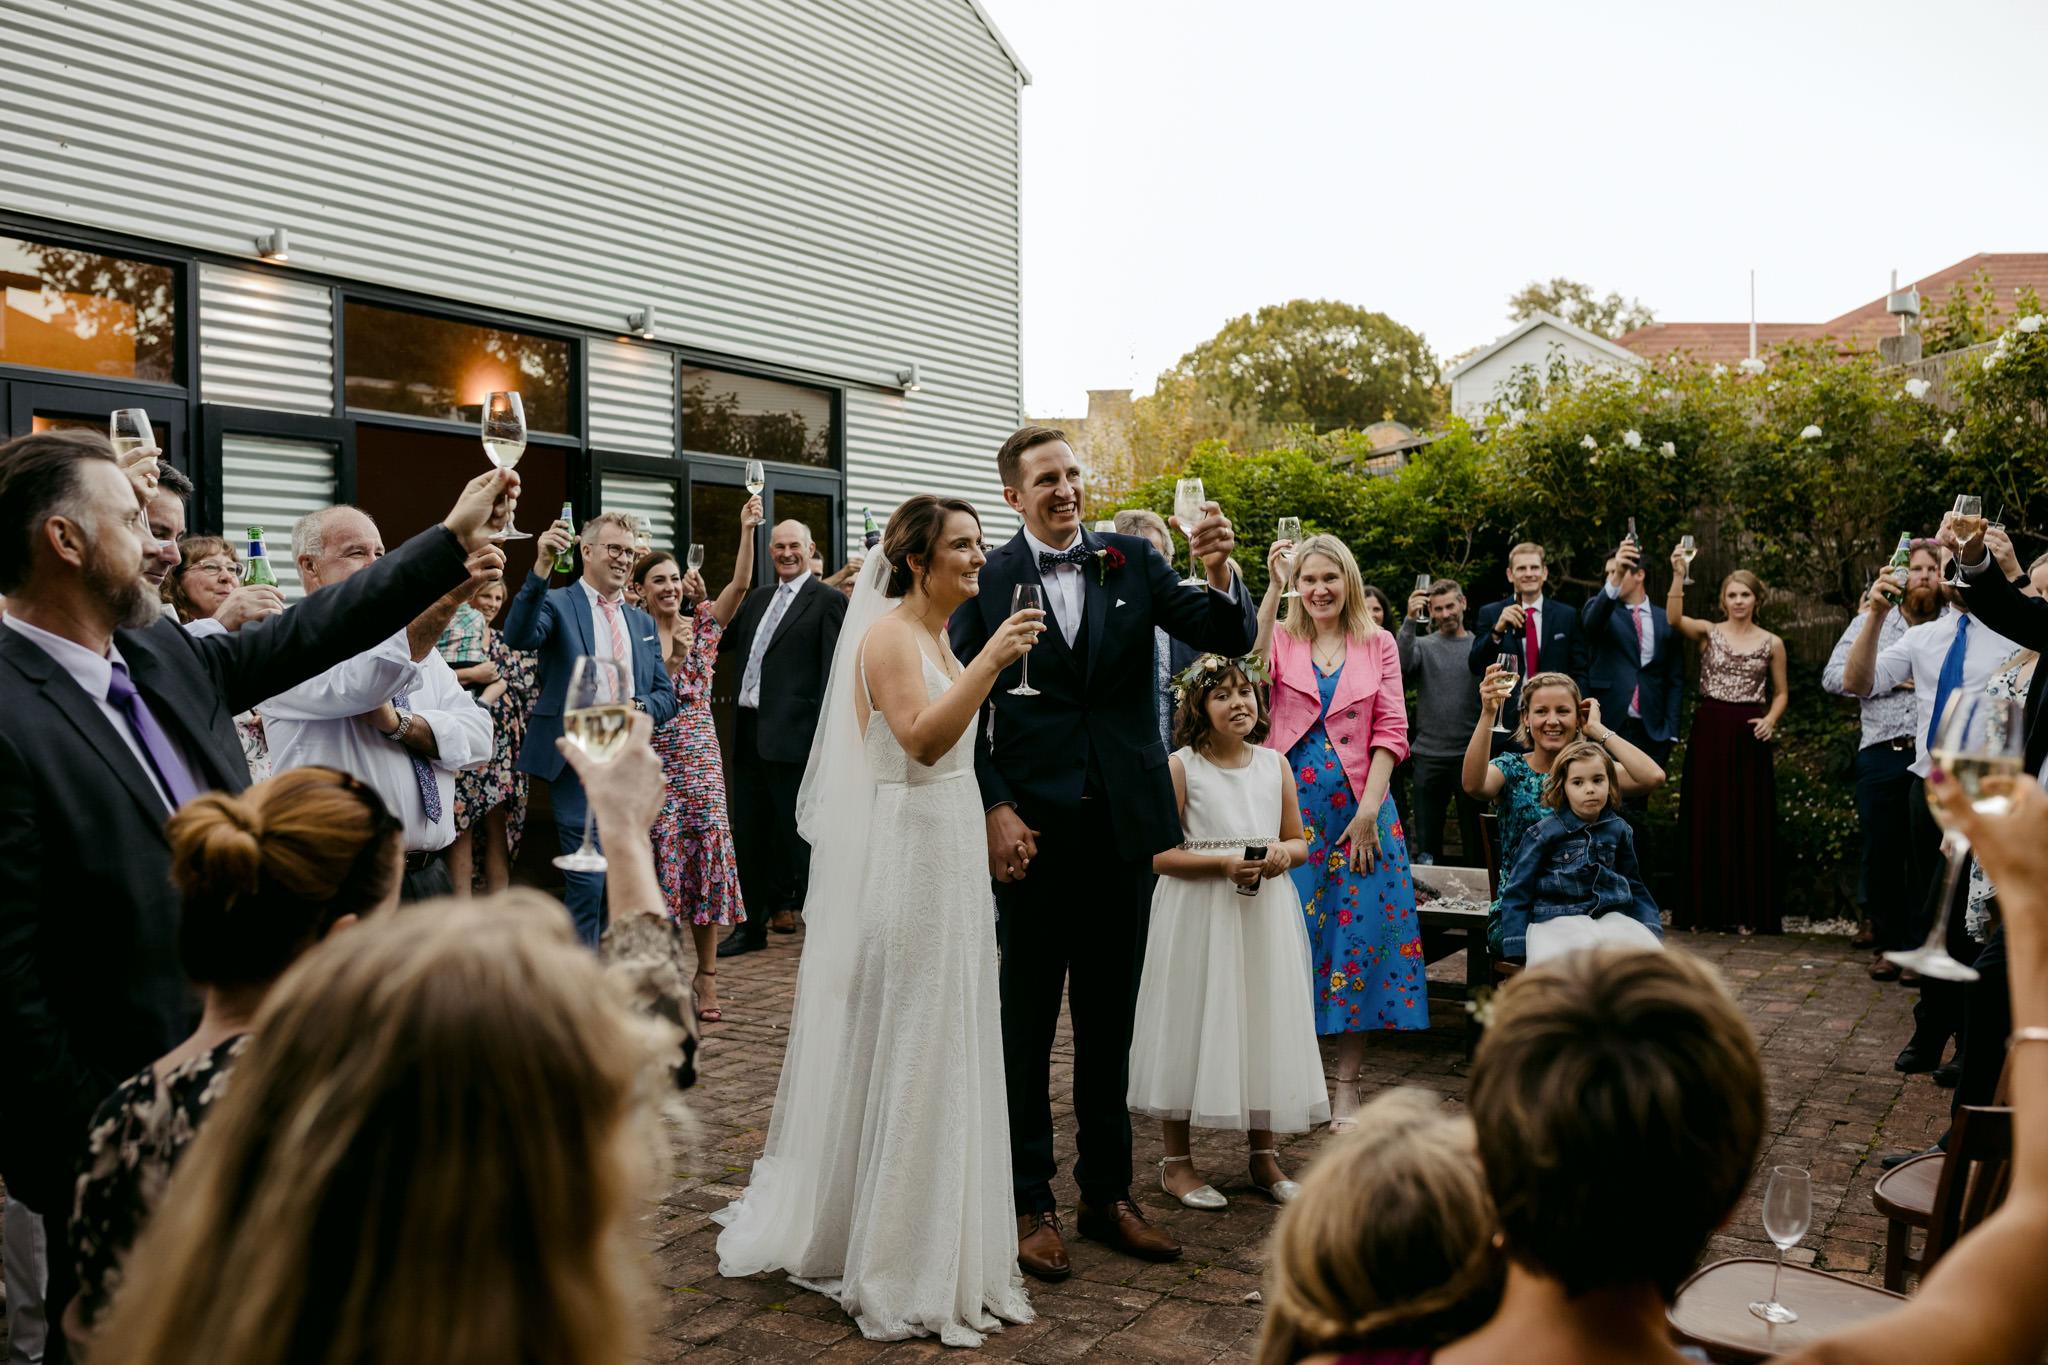 Erin Latimore Mudgee Canberra Wedding Photographer ROSEBANK GUESTHOUSE OLD THEATRE TONIC MILLTHORPE_663.JPG